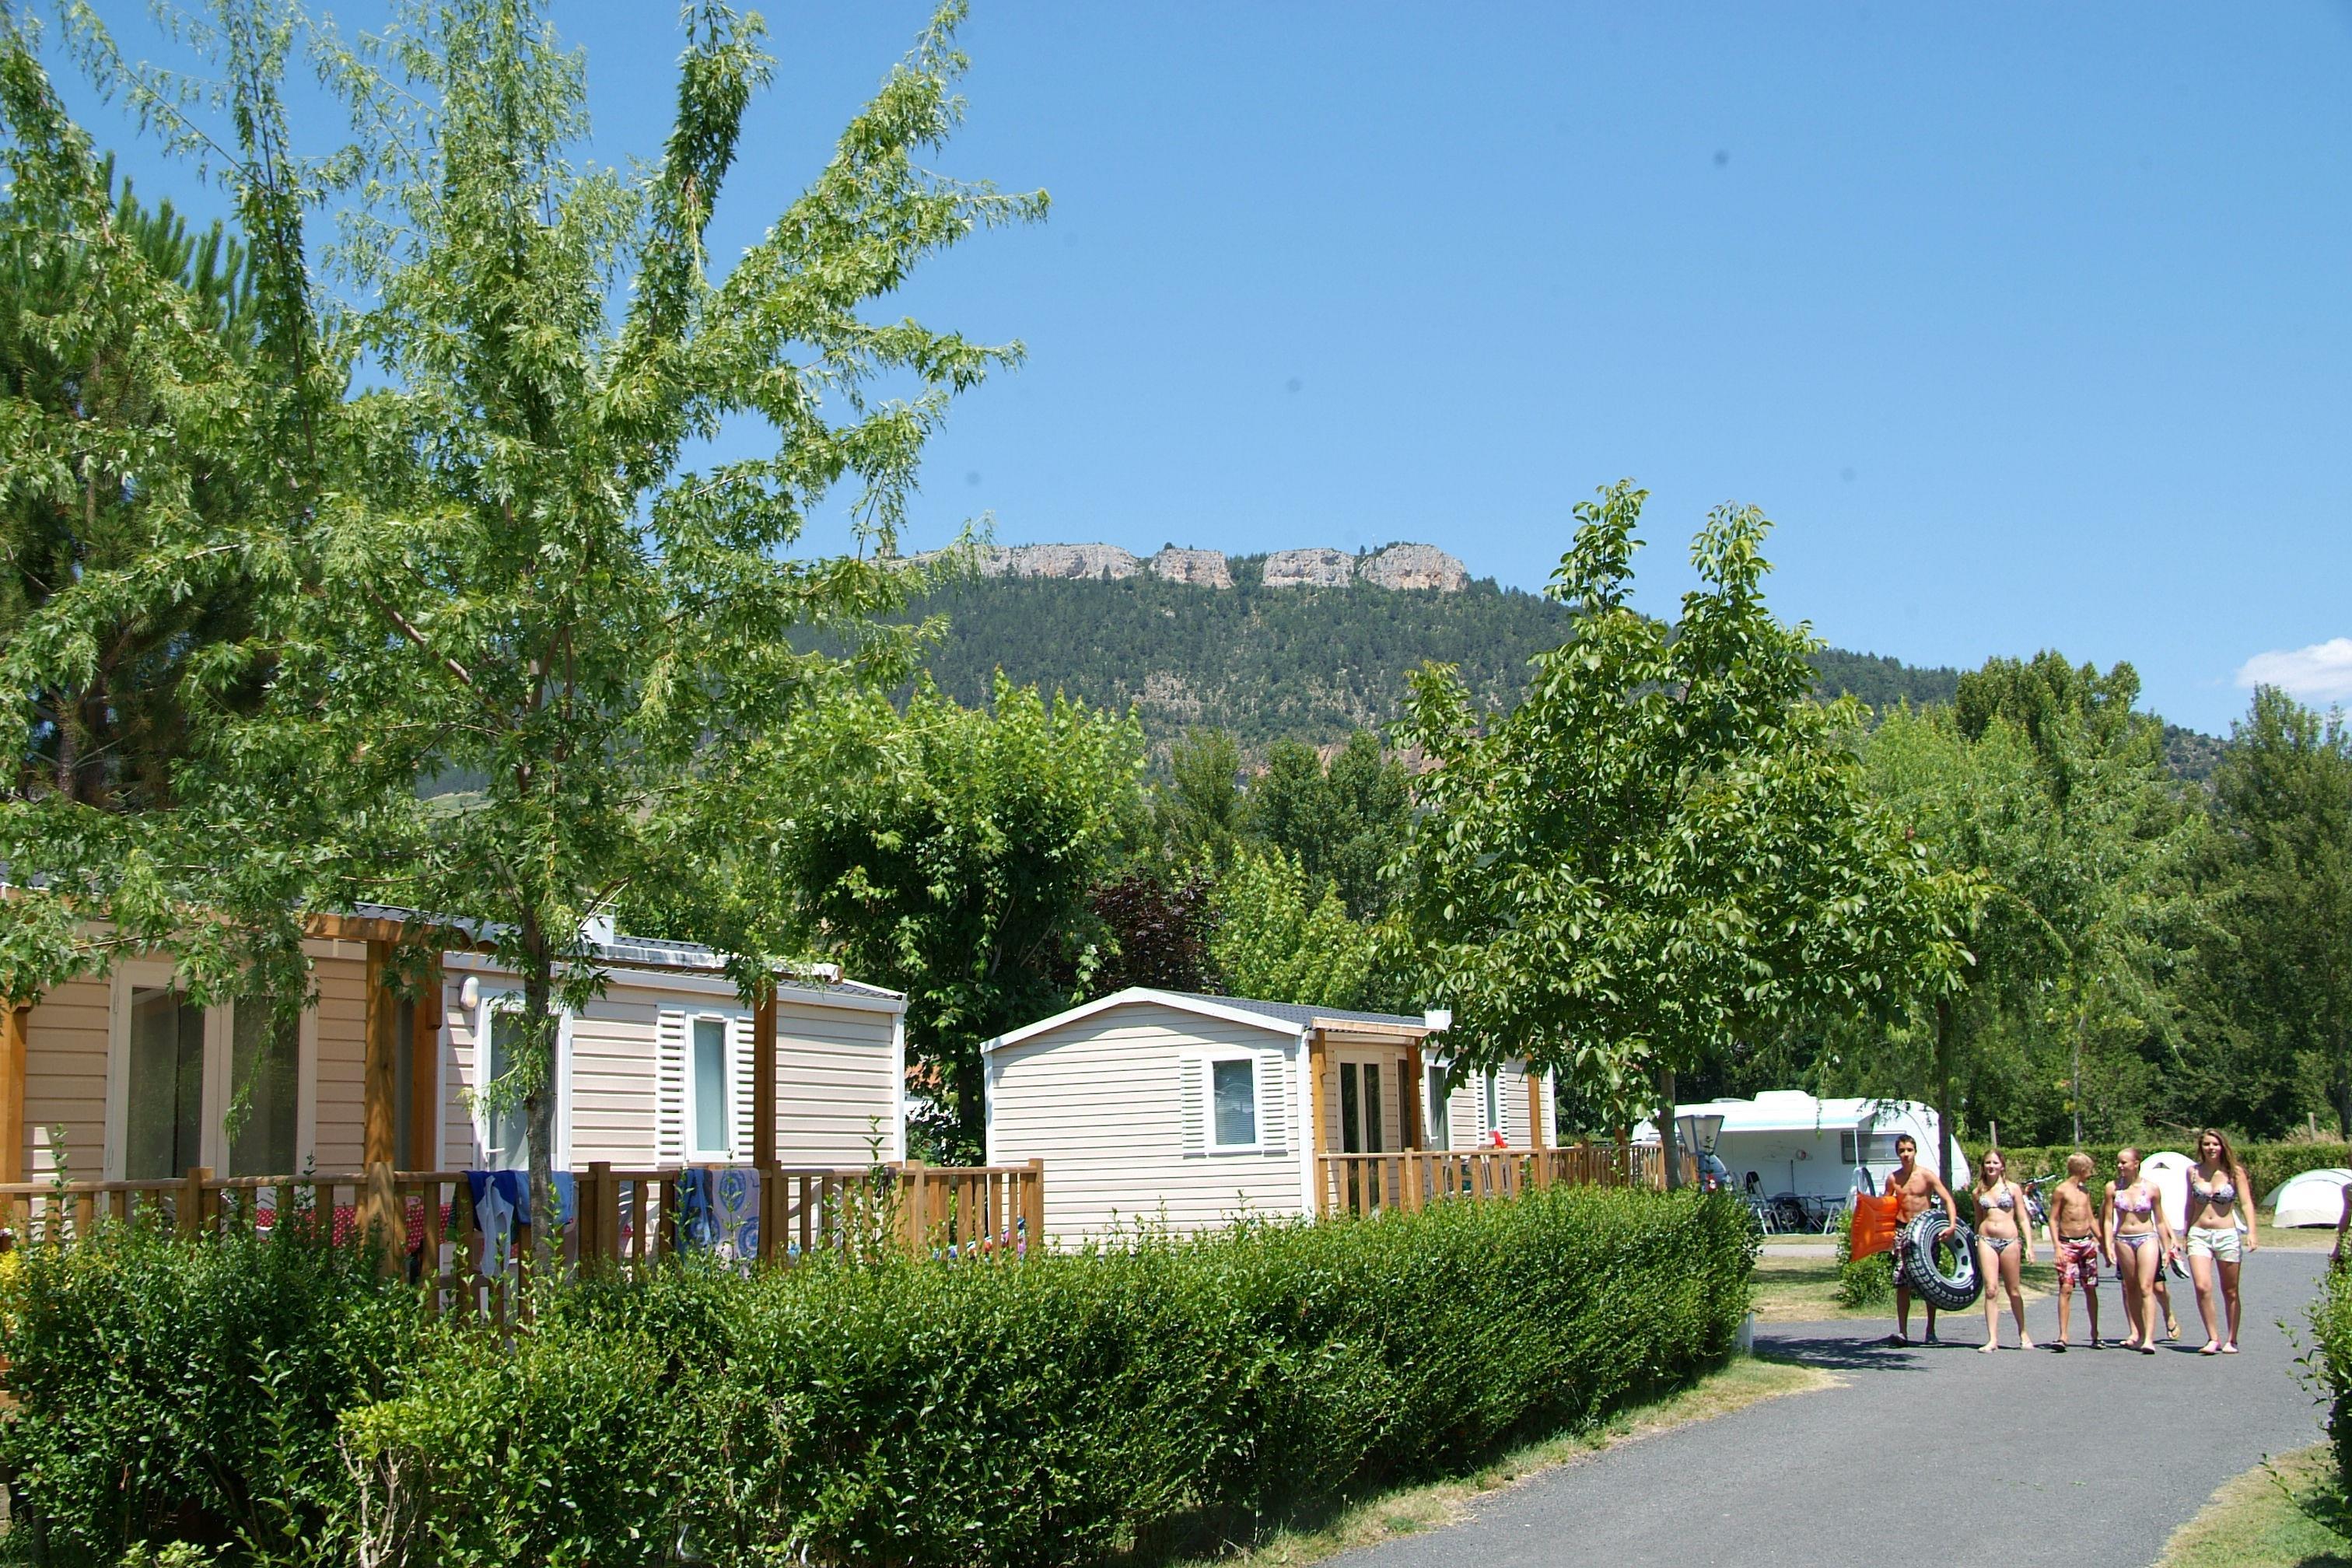 Camping Canoë Gorges du Tarn, Rivière-sur-Tarn, Aveyron